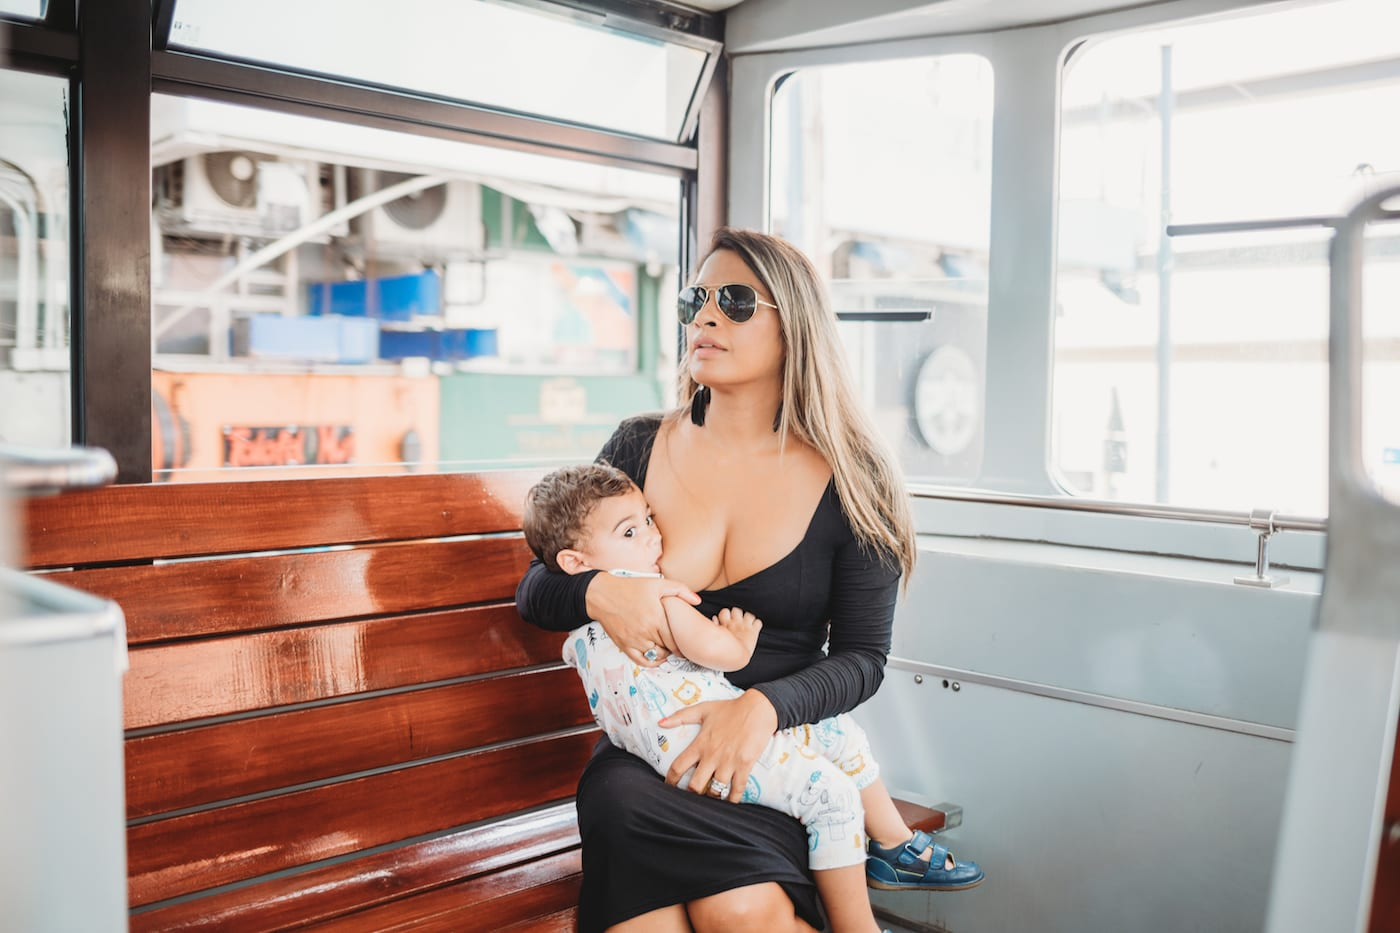 Liz Thomas discusses #ItTastesLikeLove, her campaign to decrease the stigma around breastfeeding in public